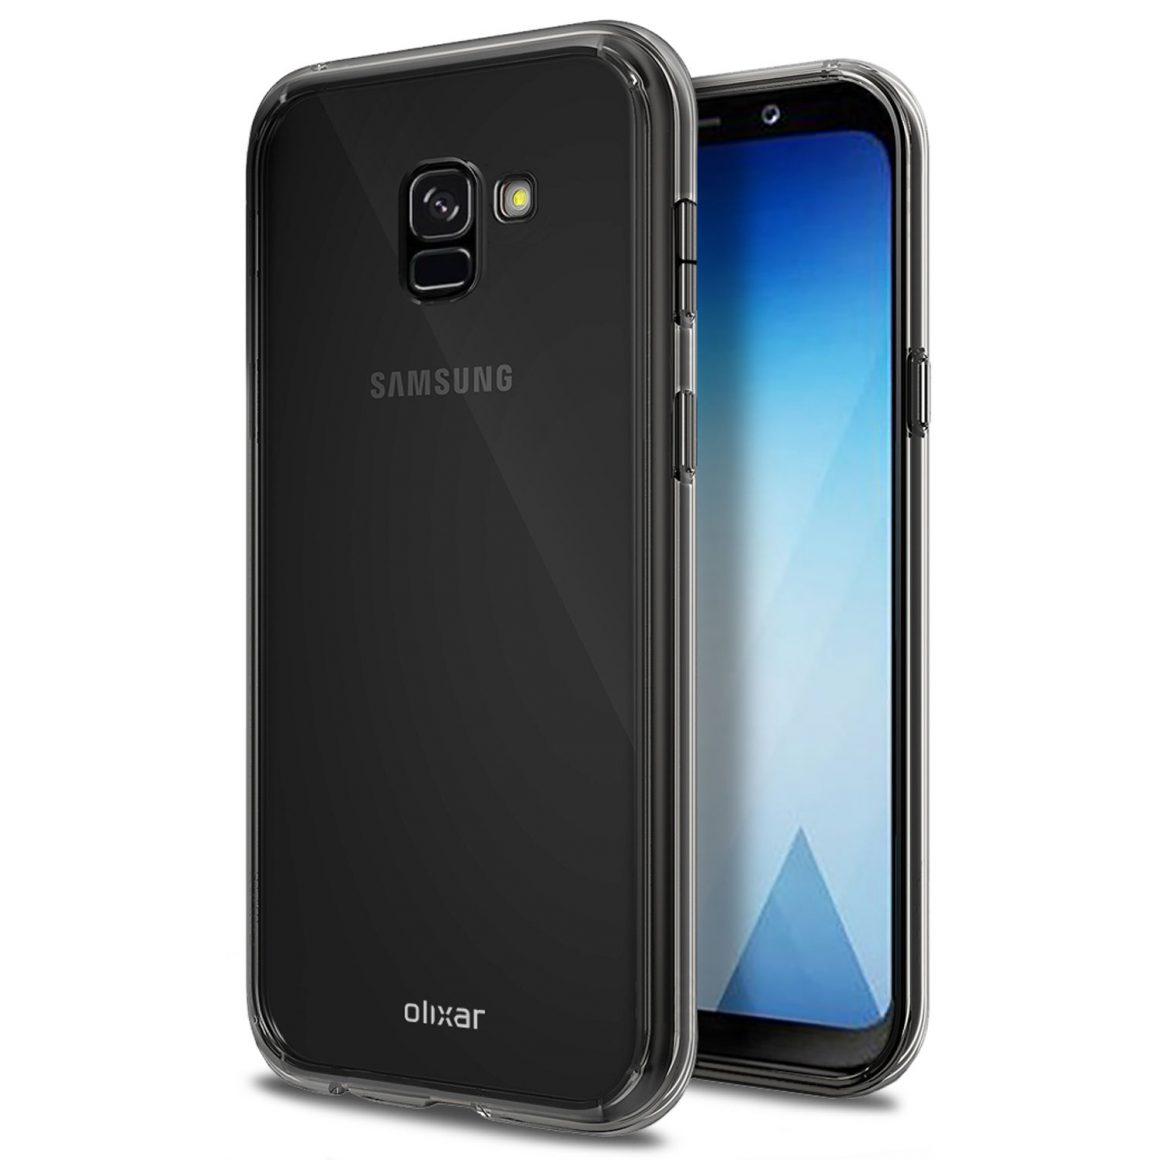 Samsung Galaxy A5 1160x1160 - Samsung Galaxy A5 con Infinity Display ma niente Android Oreo